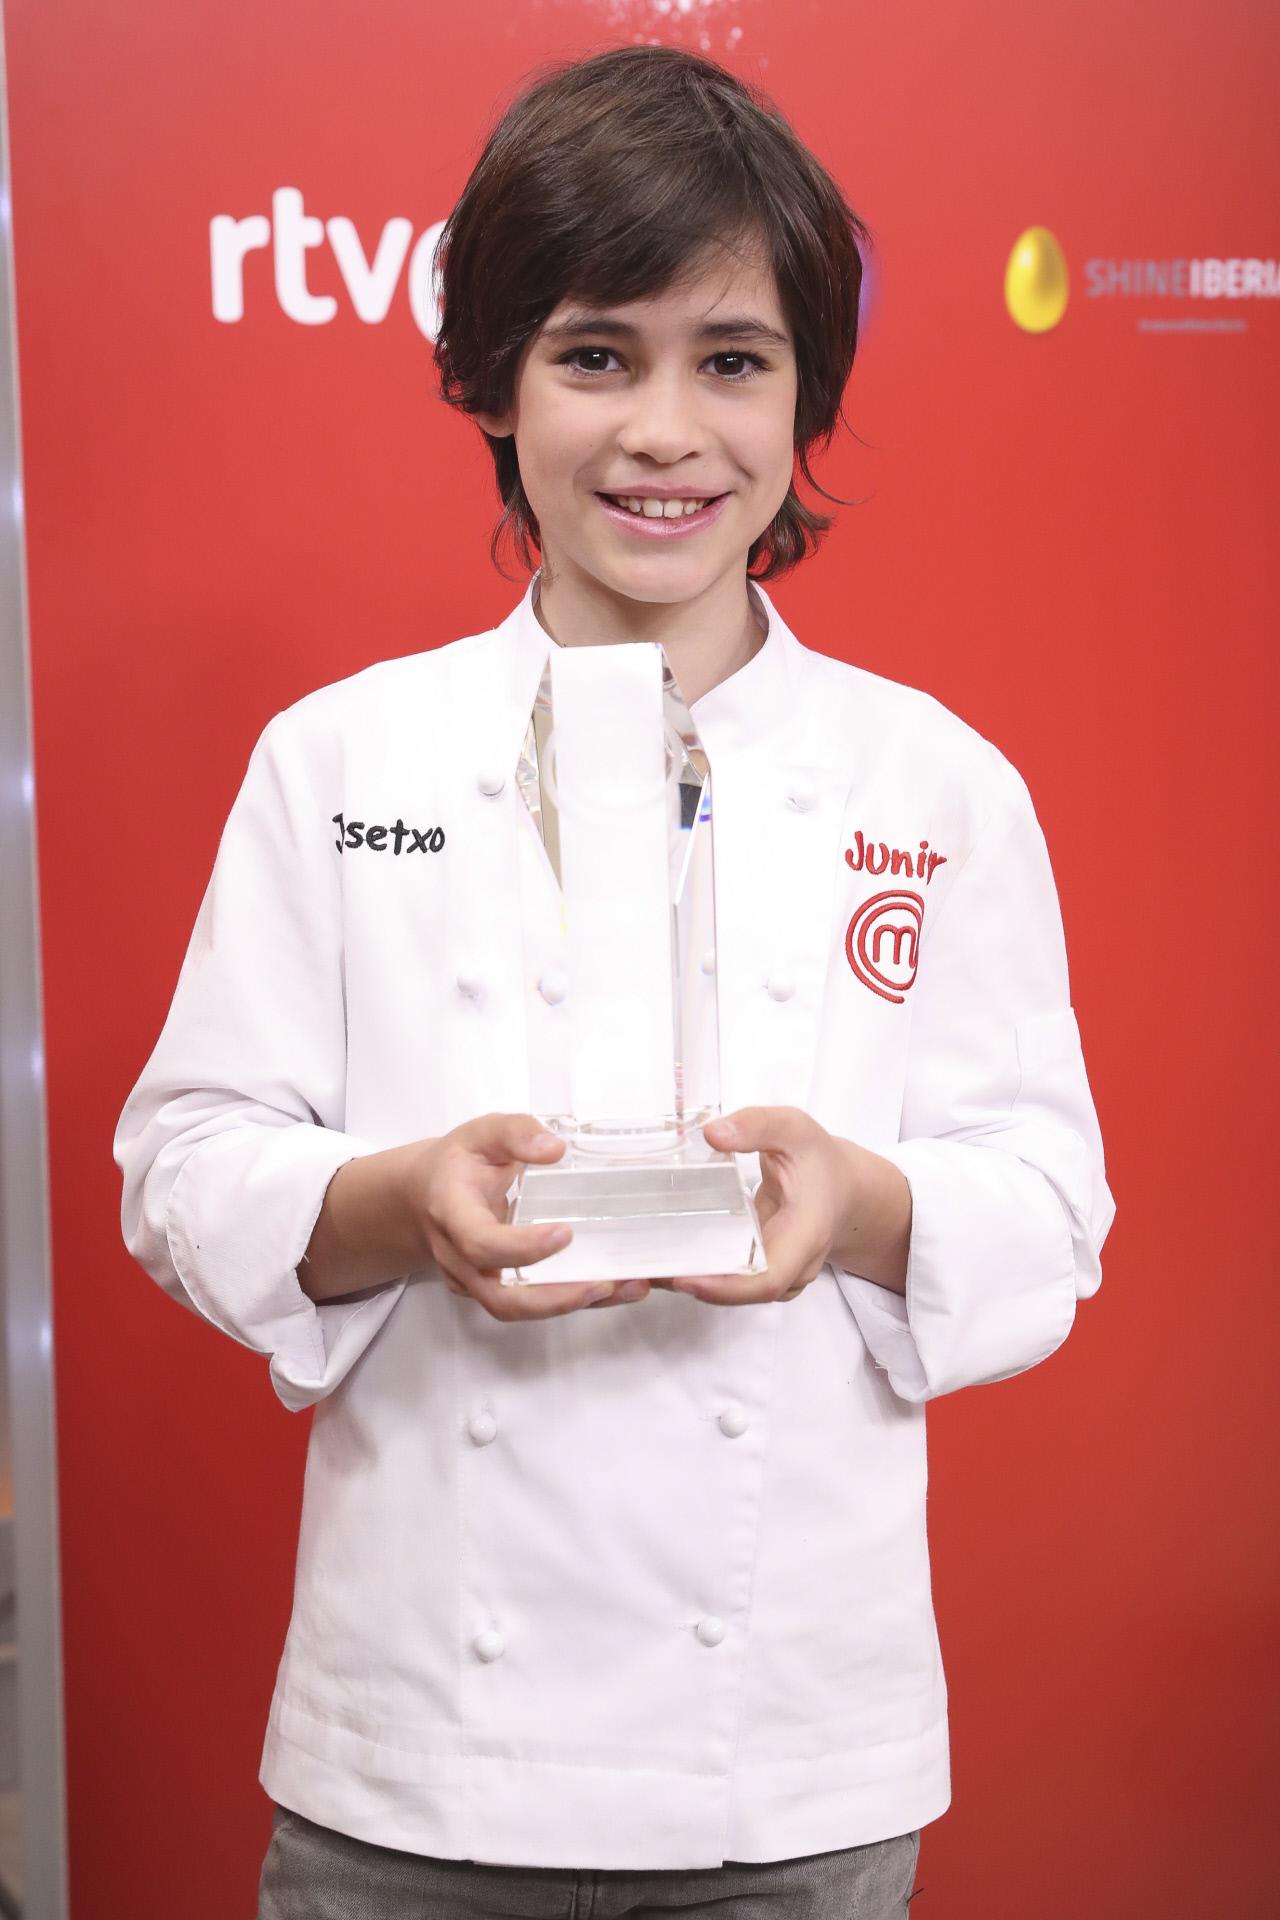 josetxo-ganador-masterchef-junior-6-mart